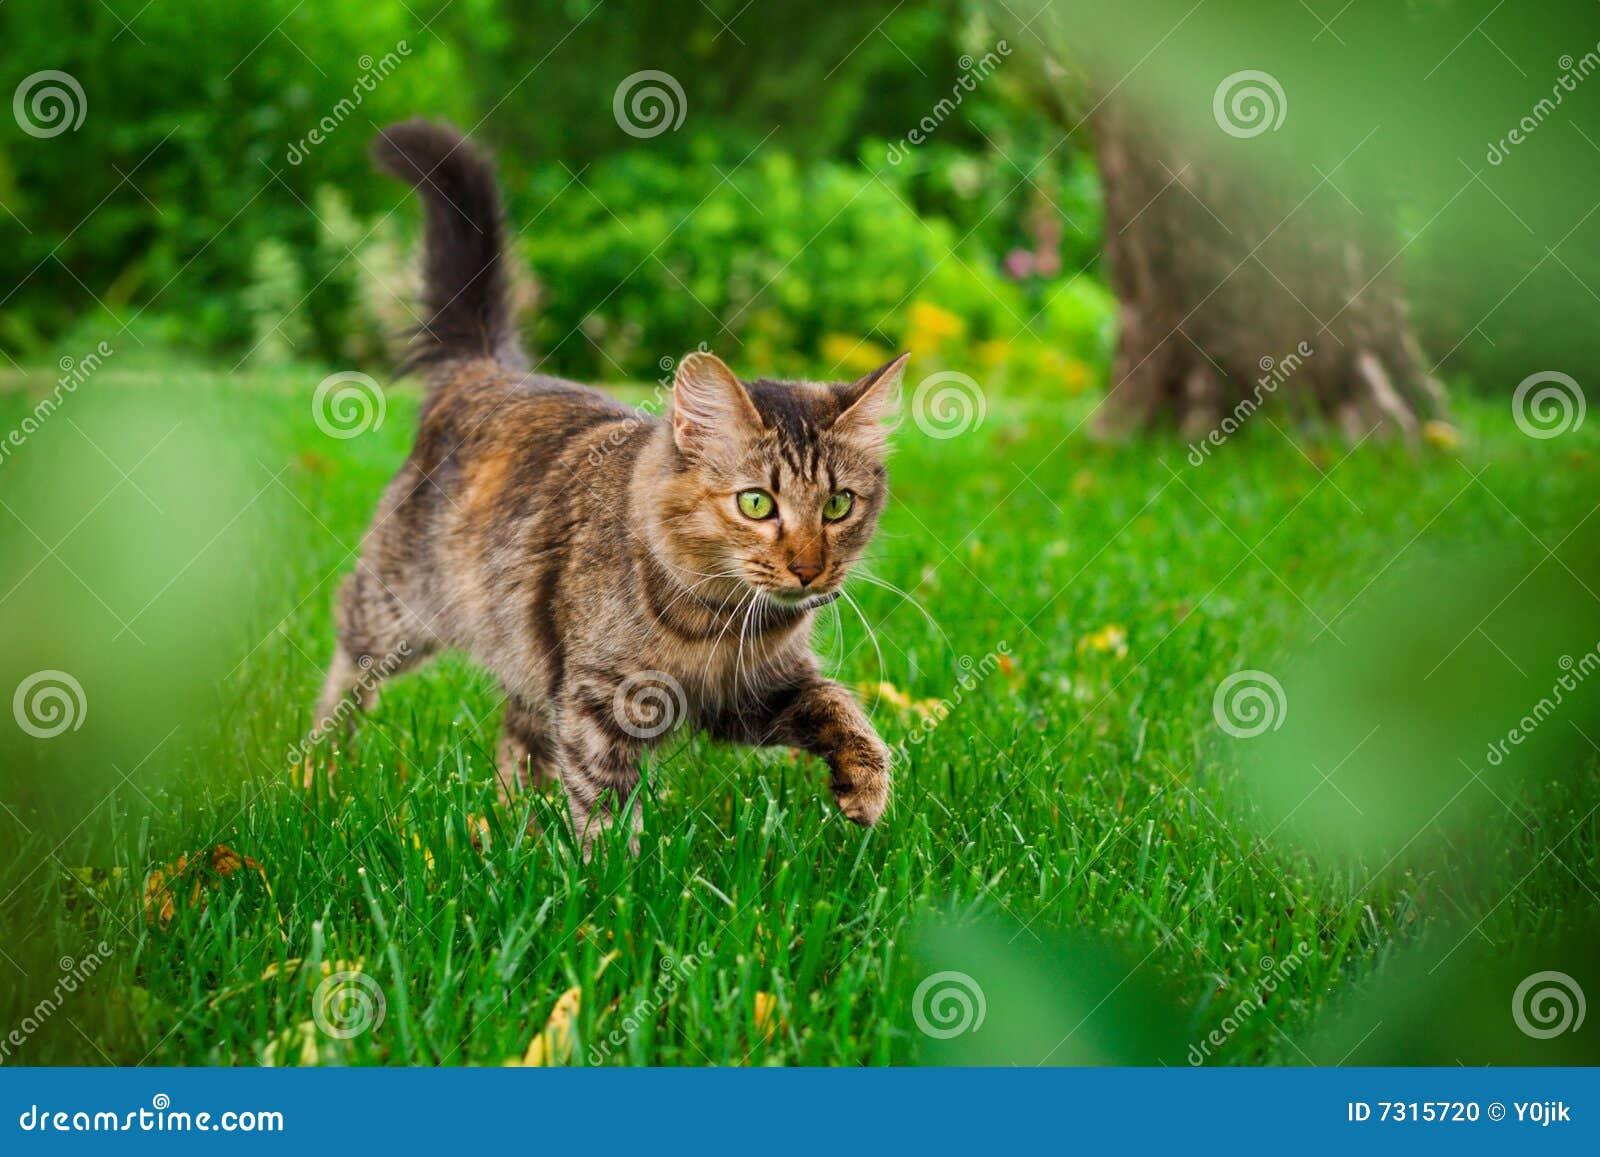 le chat chasse dans l 39 herbe verte photo stock image 7315720. Black Bedroom Furniture Sets. Home Design Ideas